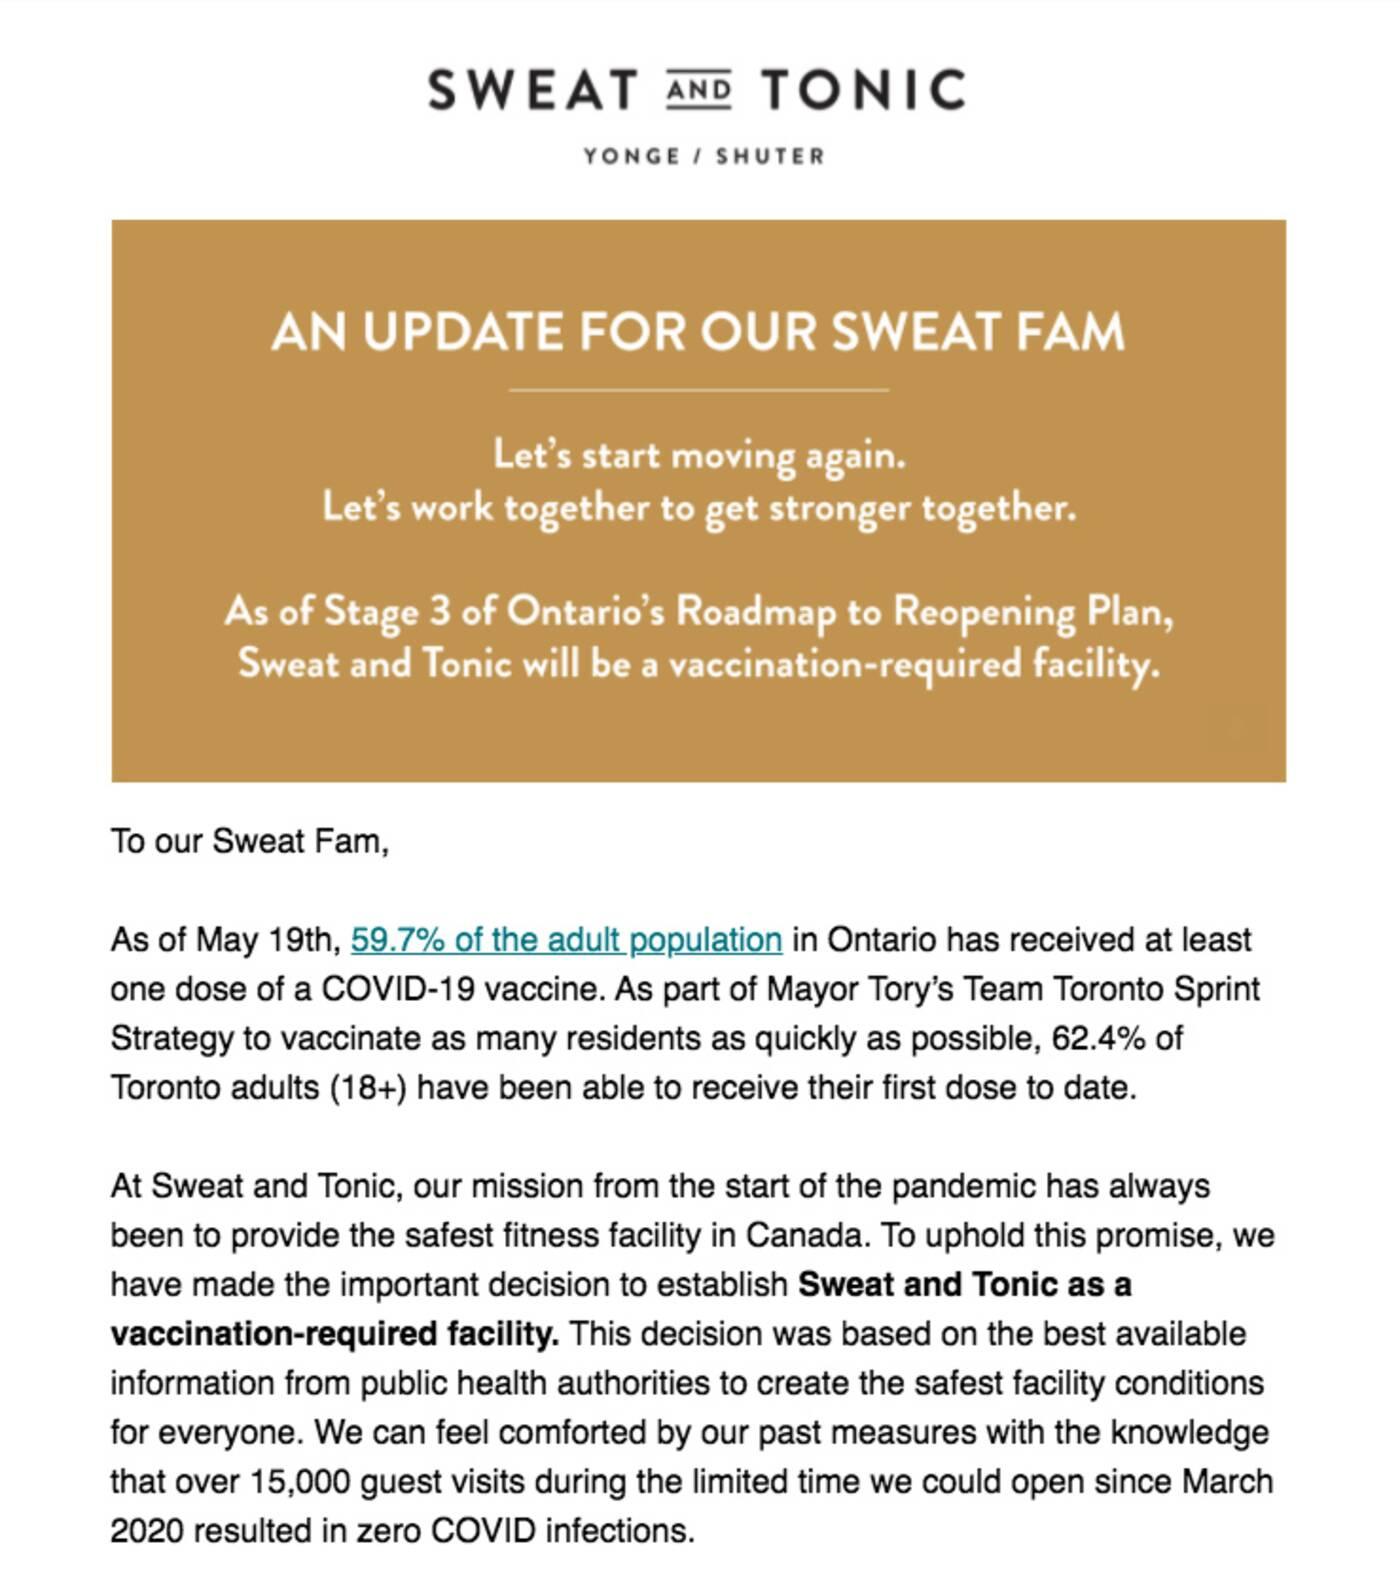 sweat and tonic